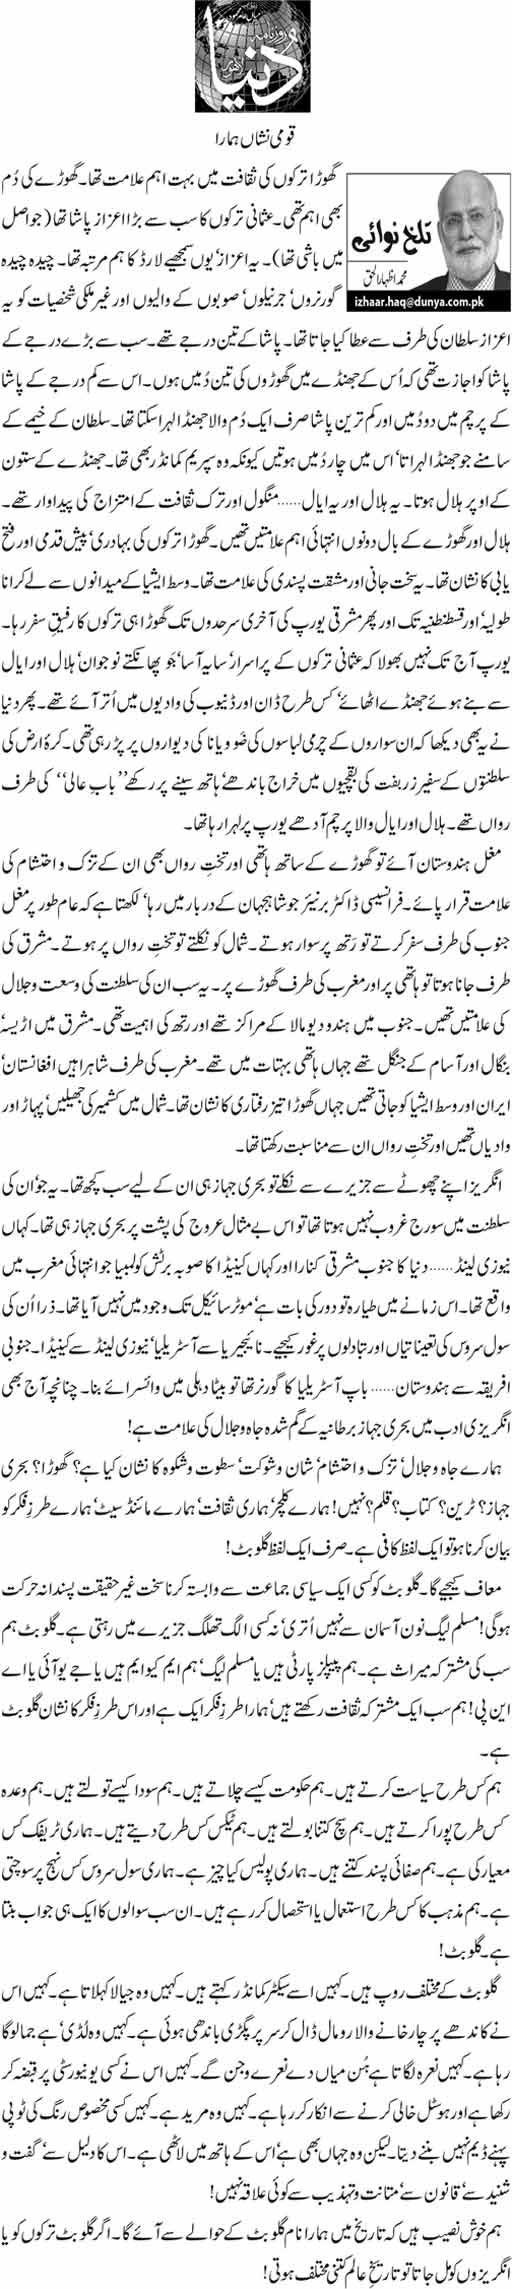 Print Media Coverage Dunya News - Muhammad Izhar-ul-Haq